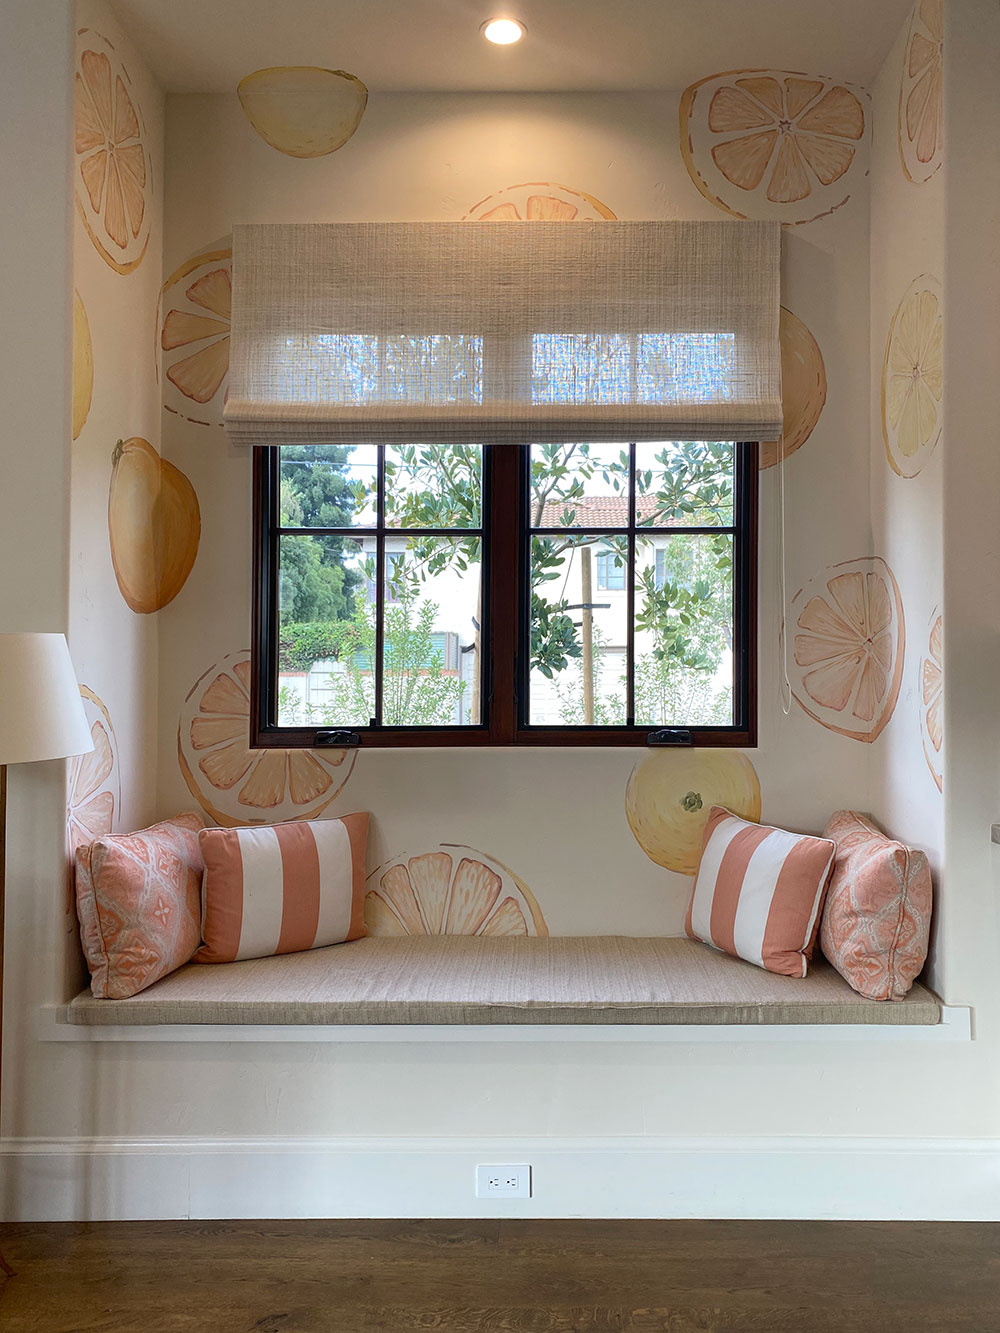 Splendid Citrus - Lemon and Orange Mural in Window Seat of House